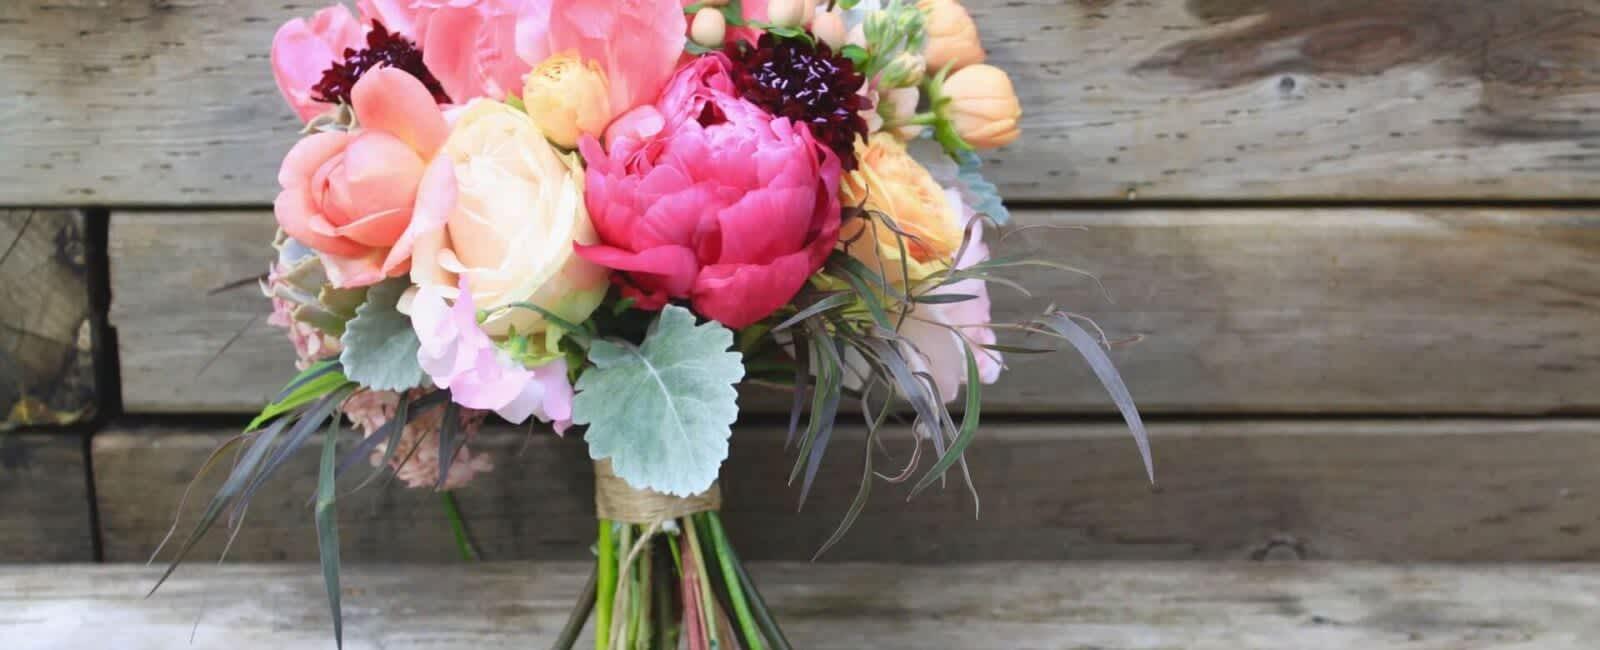 floral wedding dresses photo - 1